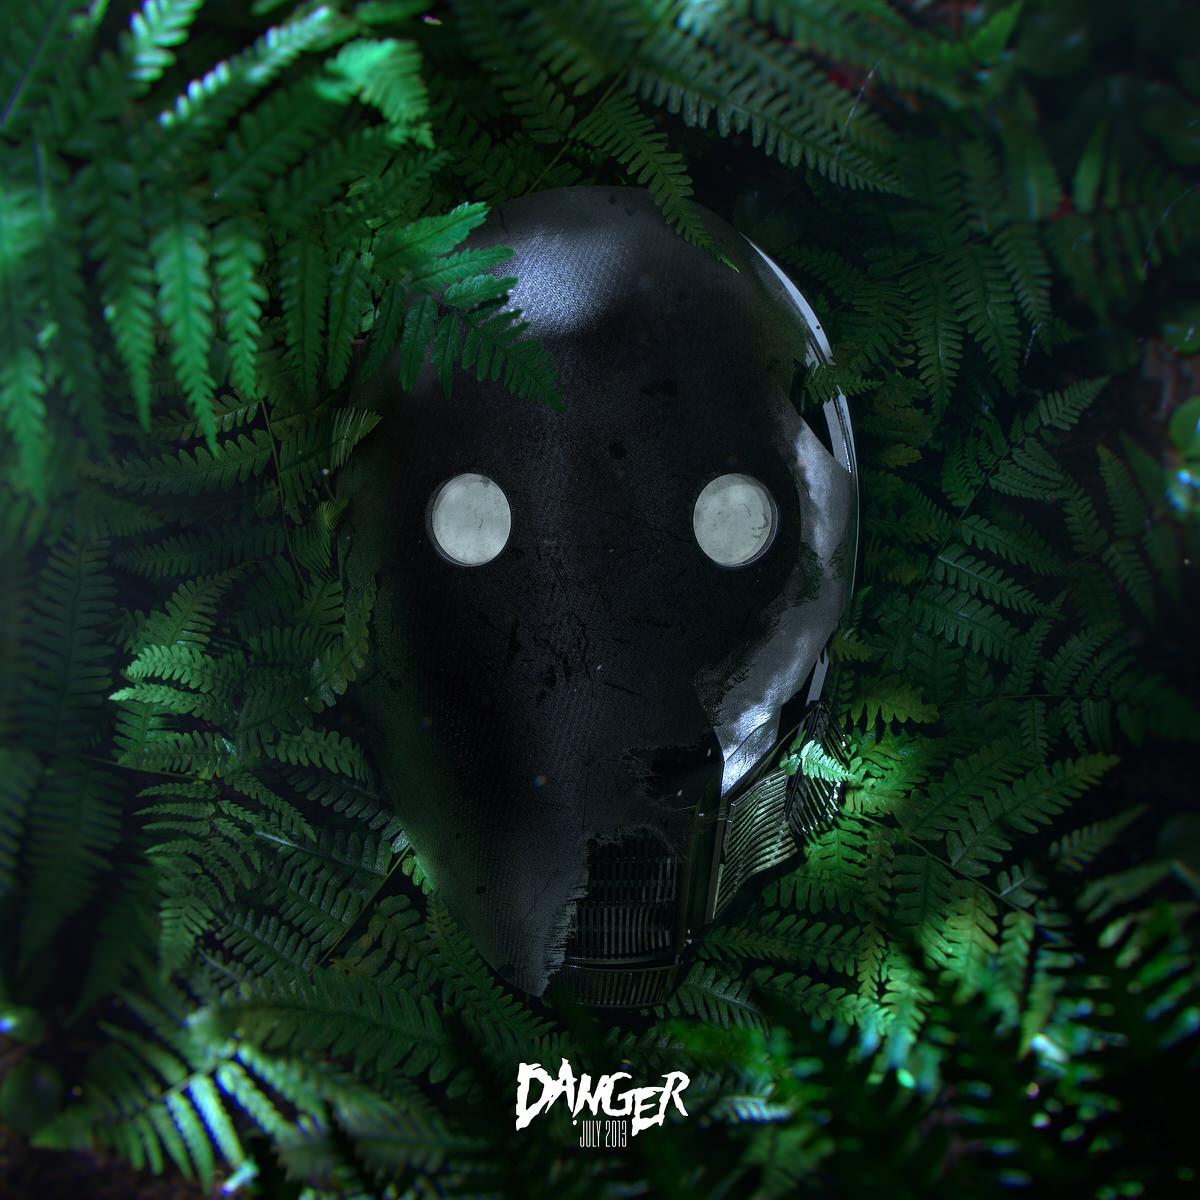 Danger - July 2013 EP - Cover